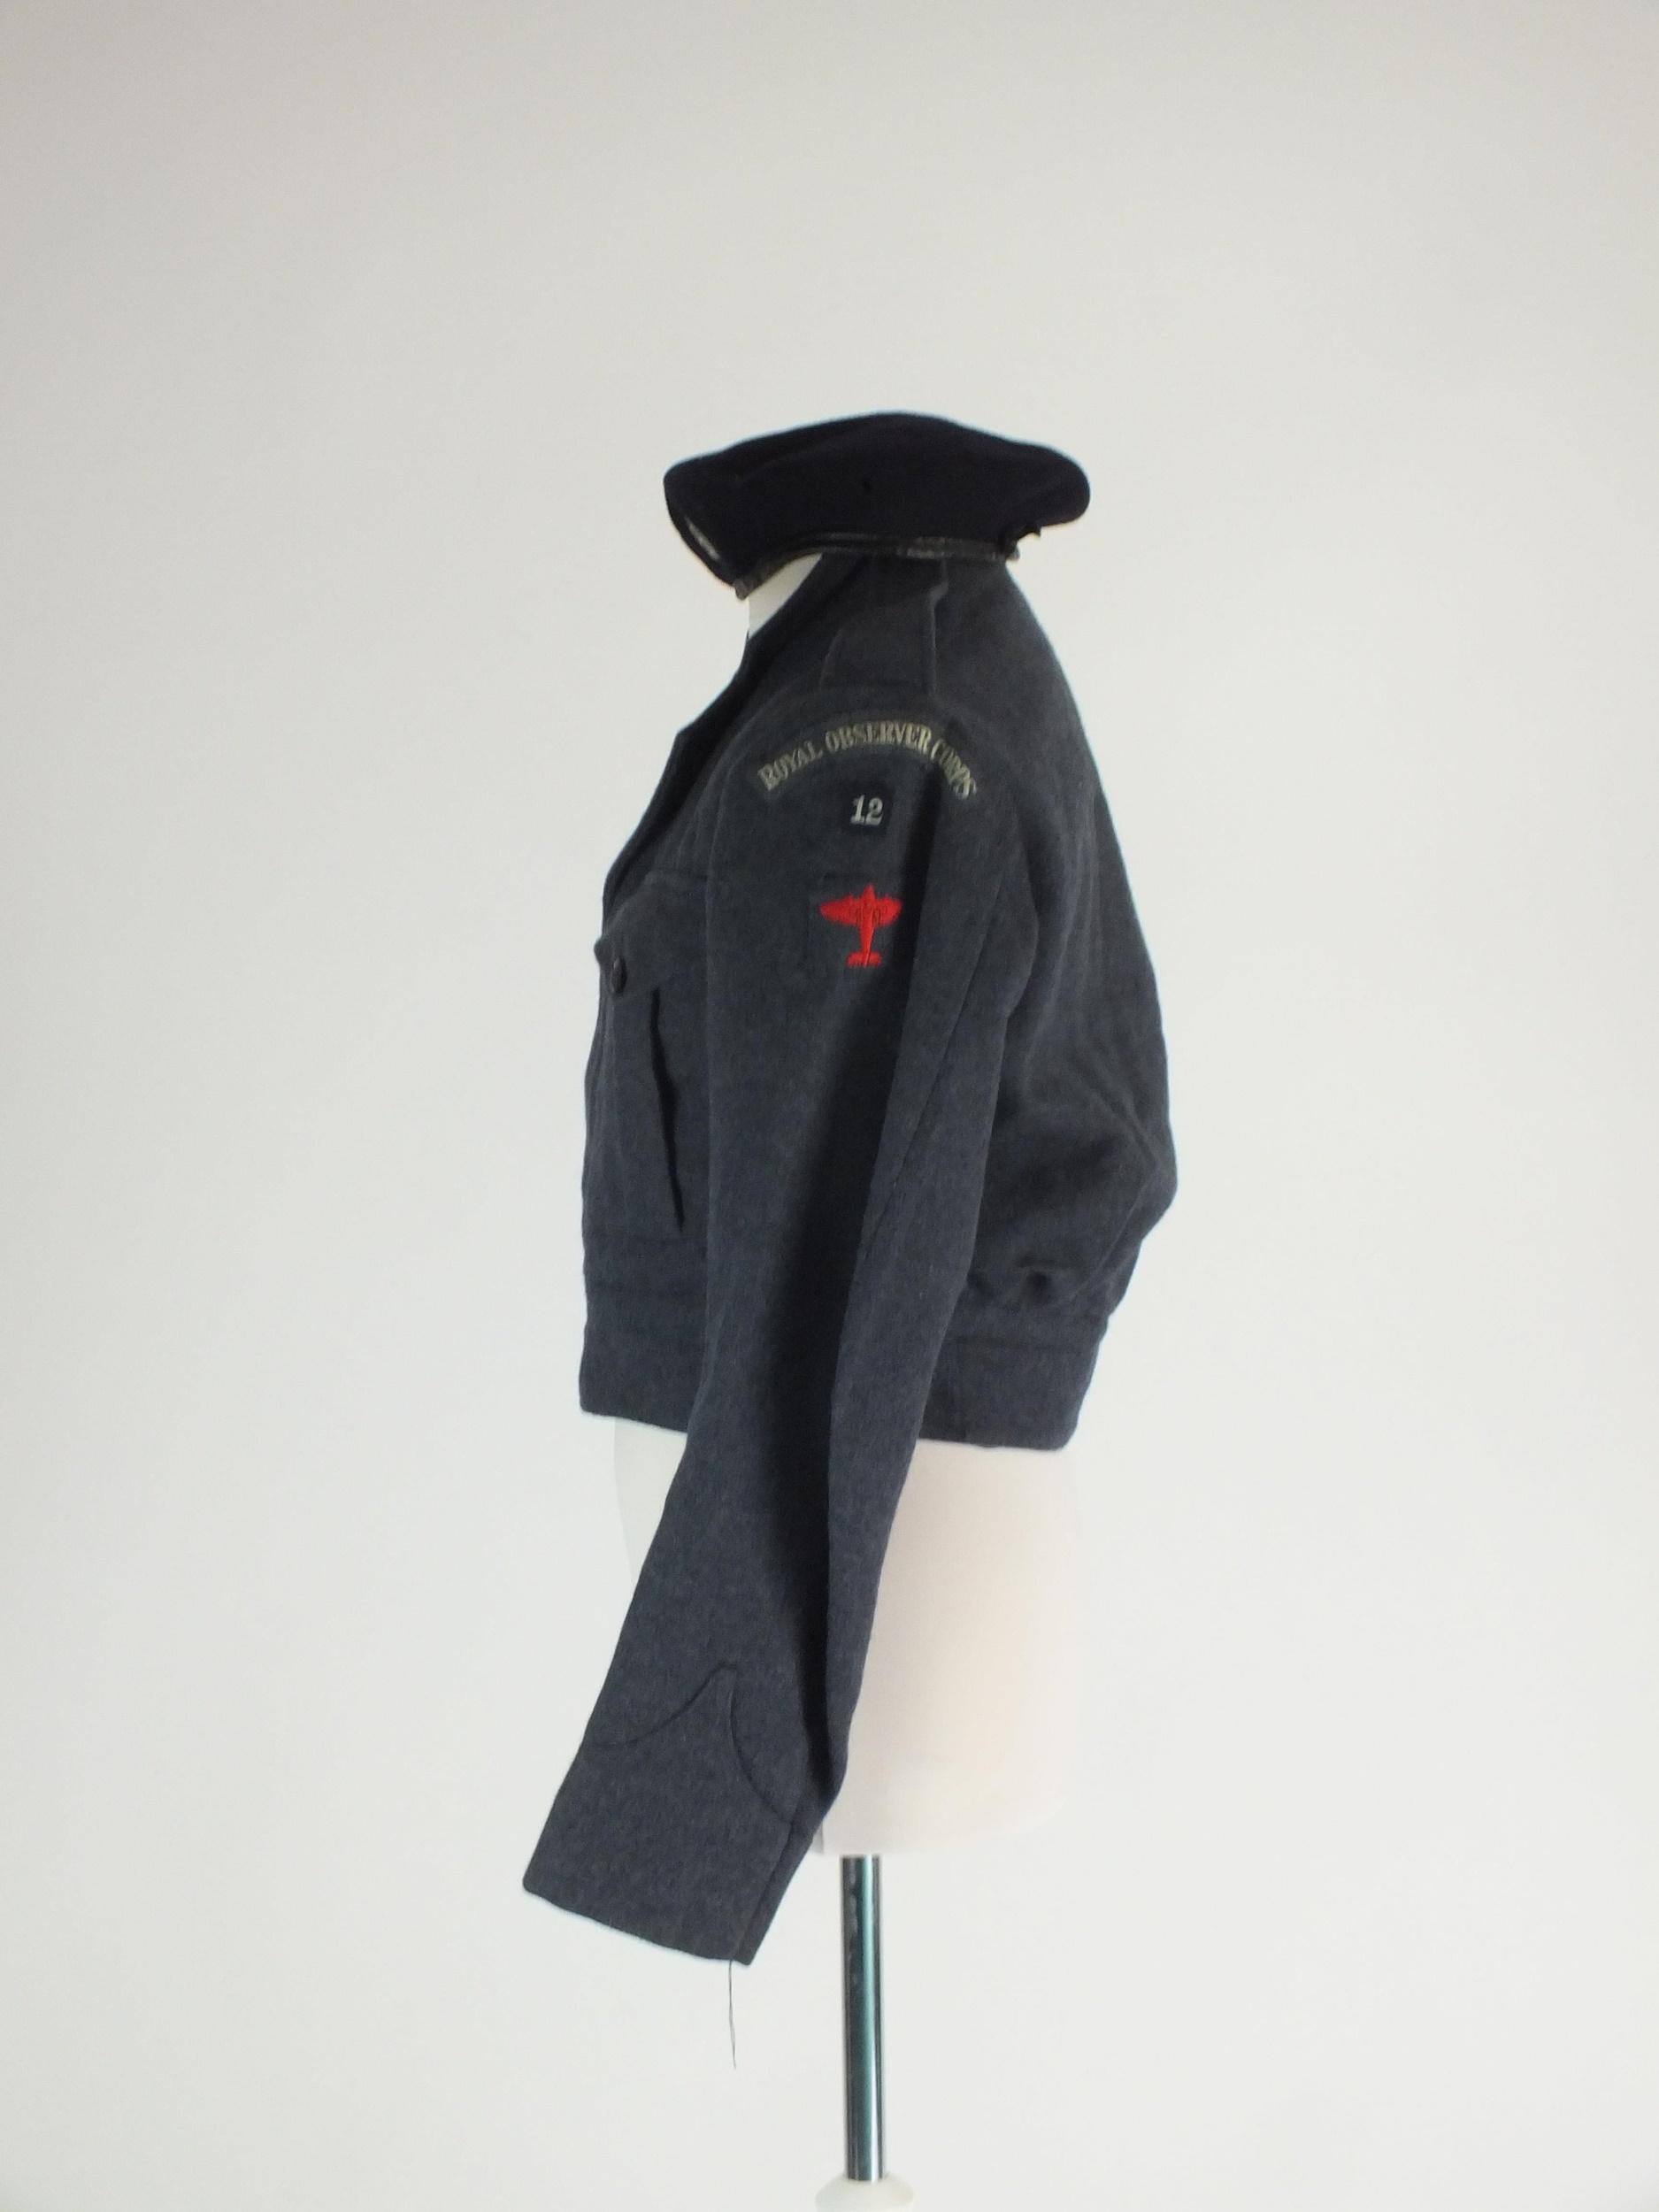 Royal Observer Corps uniform - Image 4 of 4